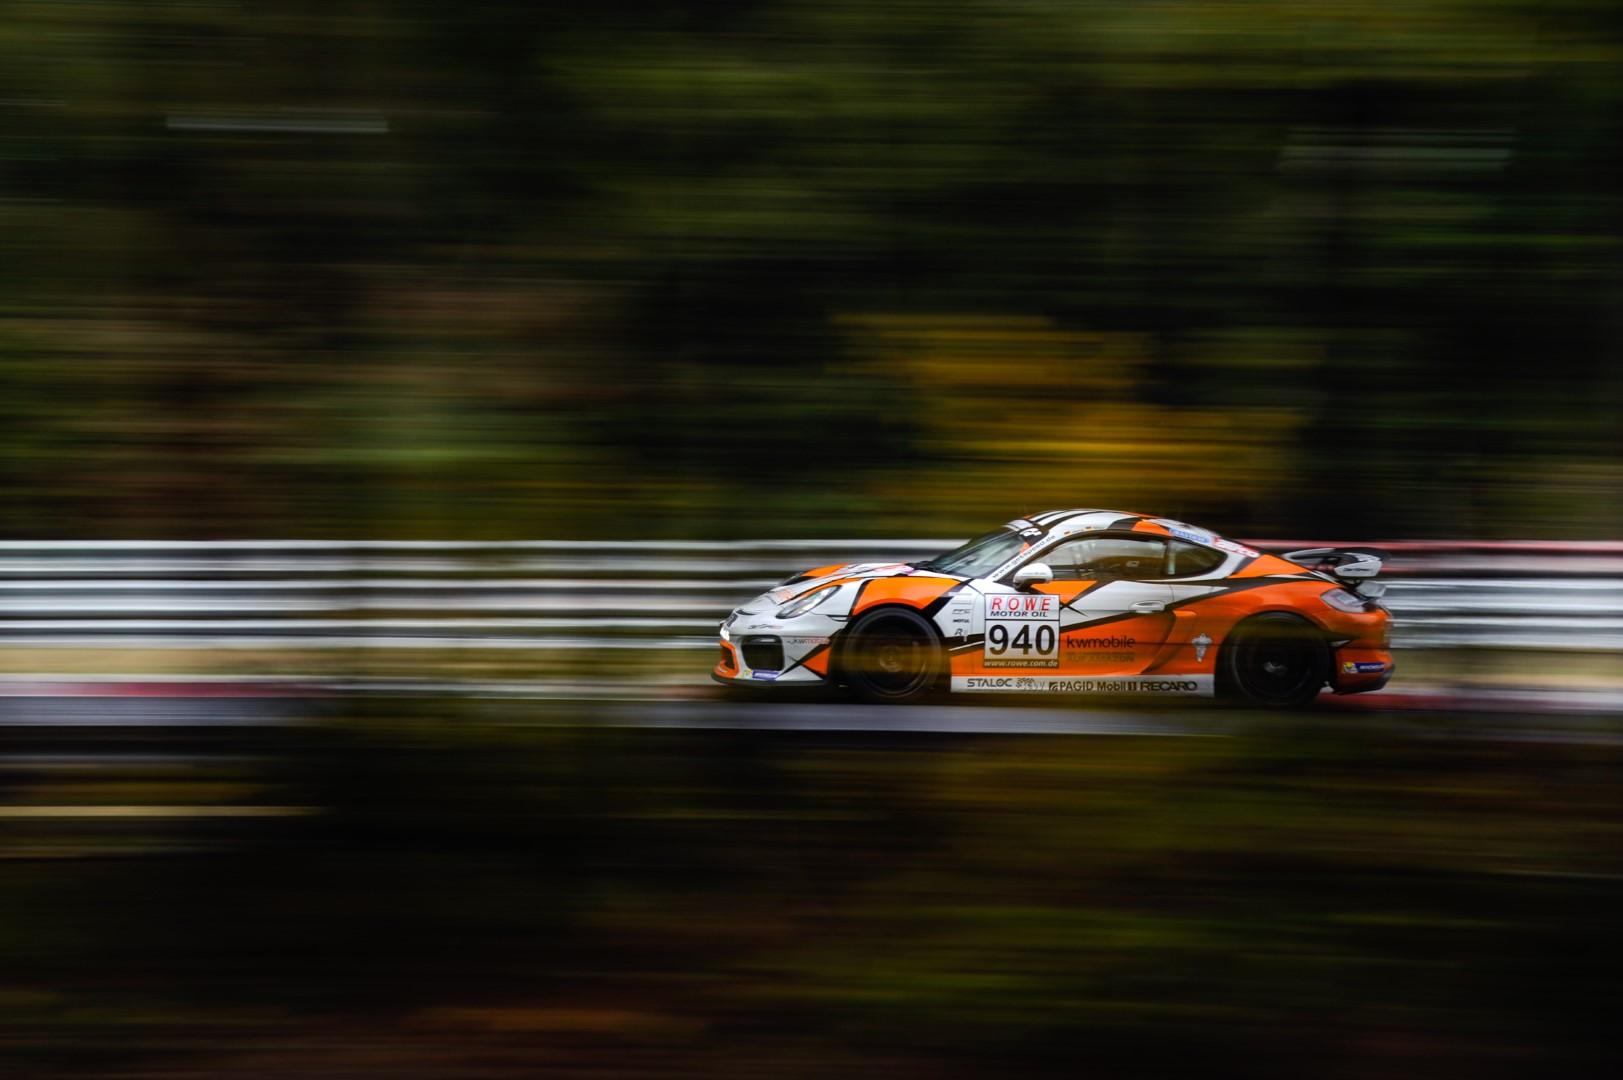 VLN 7. Lauf 2018, Nürburgring-Nordschleife - Foto: Gruppe C Photography; #940 Porsche Cayman GT4 CS, GIGASPEED Team GetSpeed Performance: Max, Jens